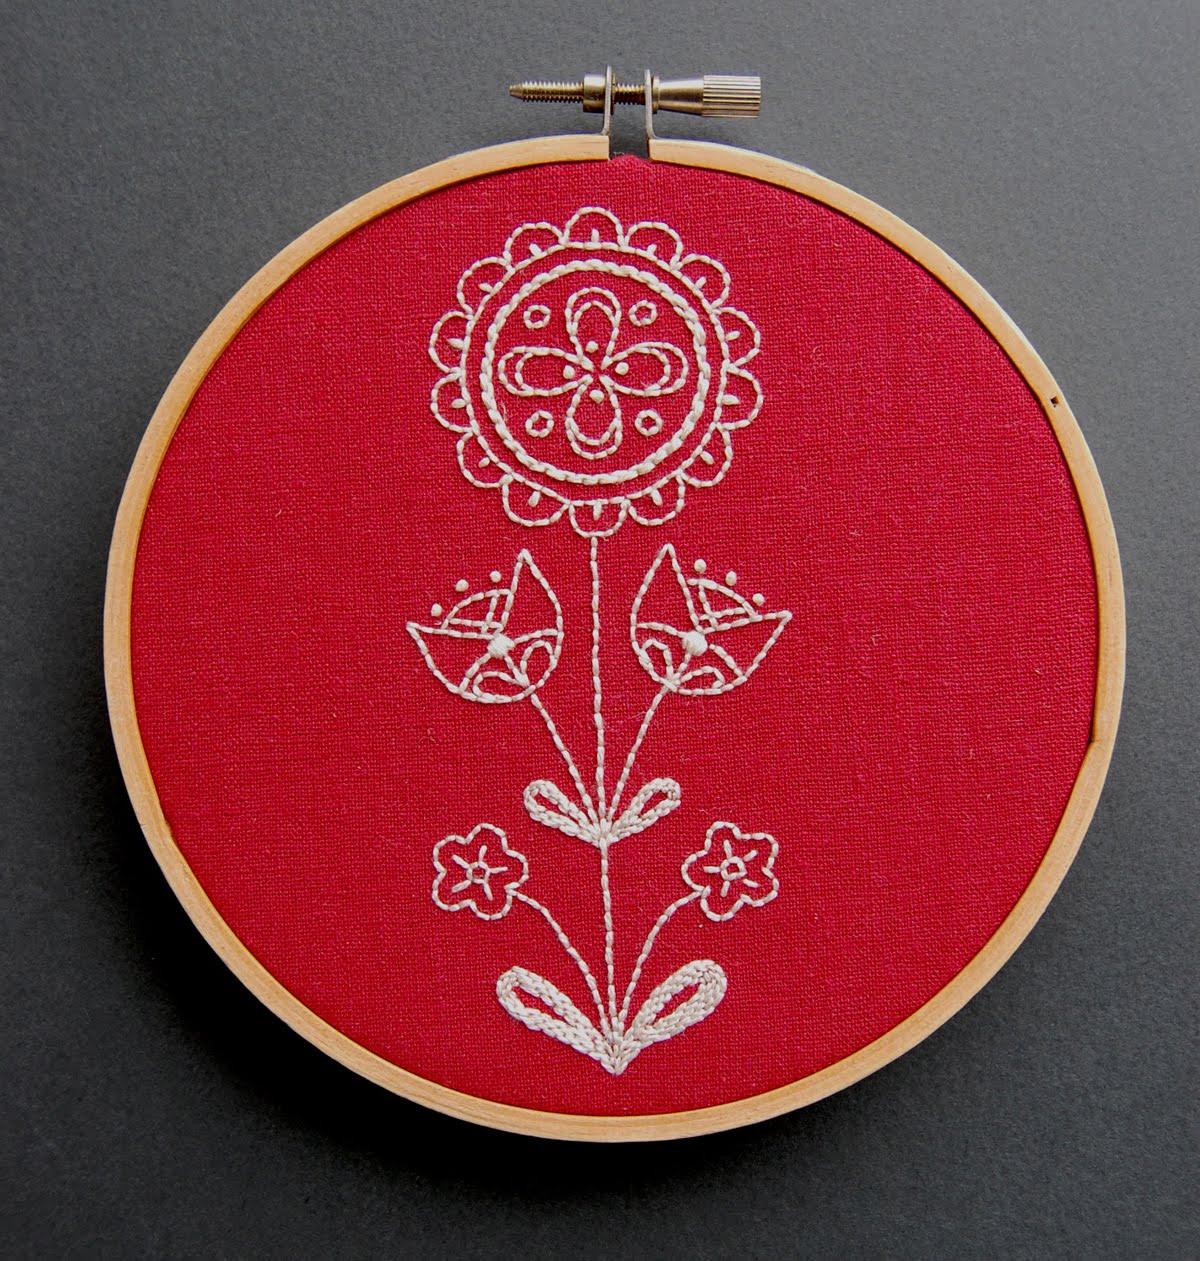 Tifaifai antique additionally 350436414726050456 likewise Pattern Spring Skinnie EejJoC1LsLXTtMrvH3R7FQ9MCm4YcjLDqmH9PLcSxcs likewise Custom Quilting likewise 191754896608456979. on quilt patterns